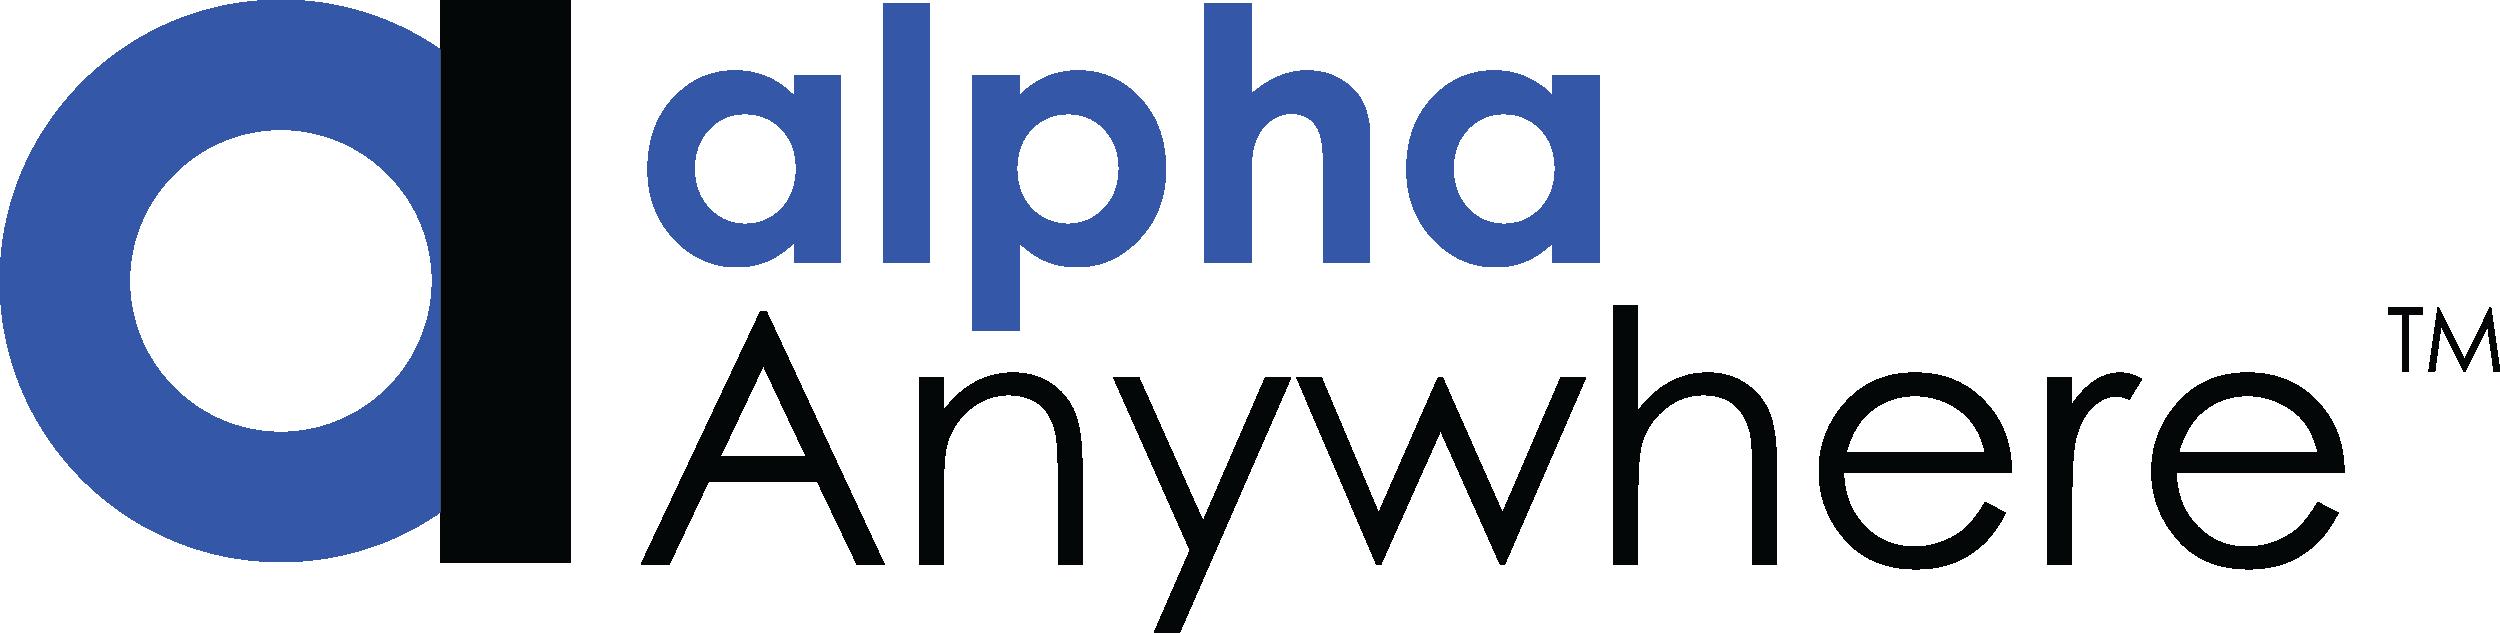 Alpha Anywhere 4.5.4 now Available